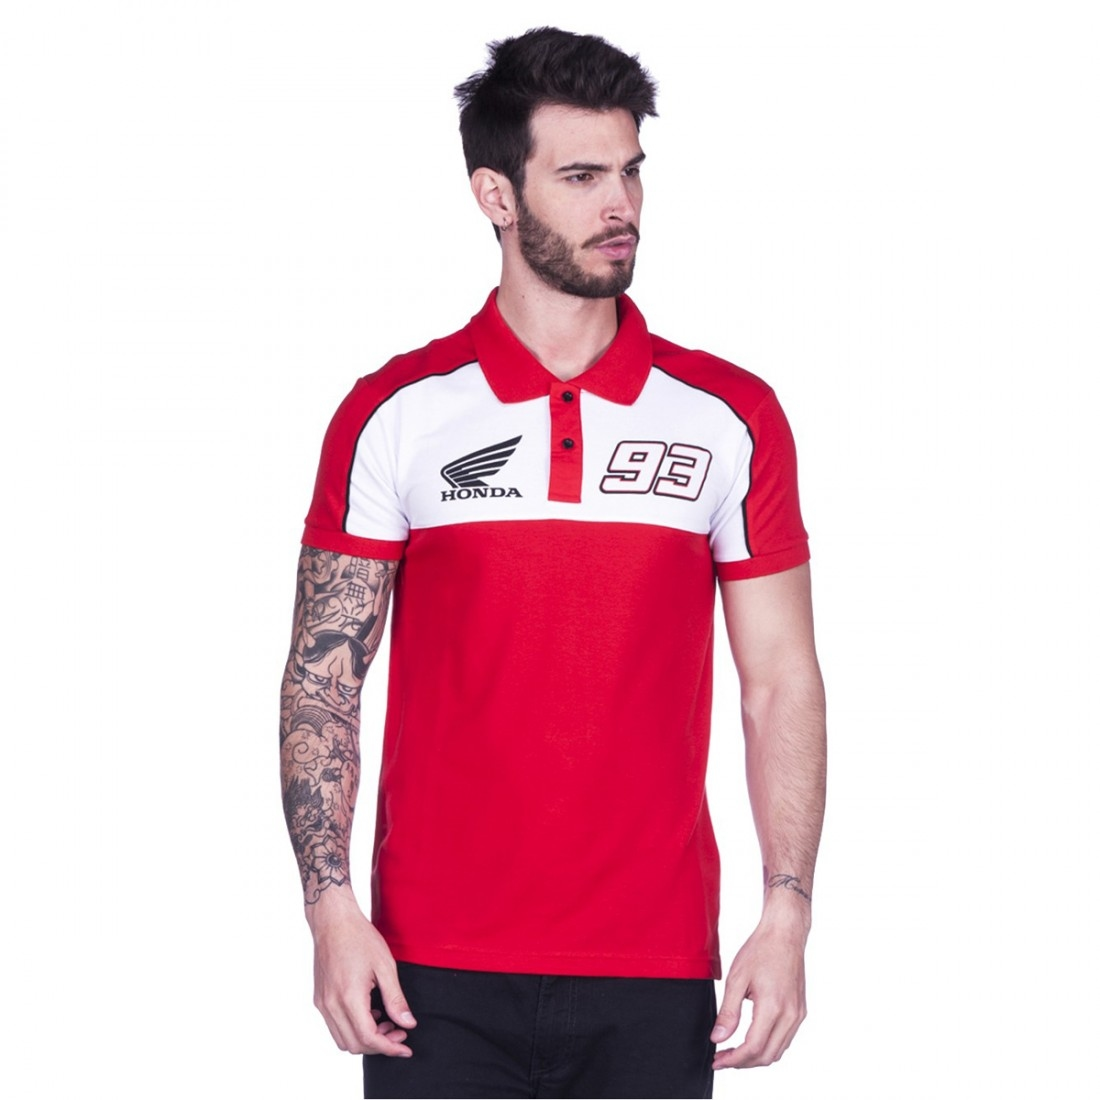 ab49665cd7b28 Camiseta GP APPAREL Marc Marquez 93 1718002 · Motocard